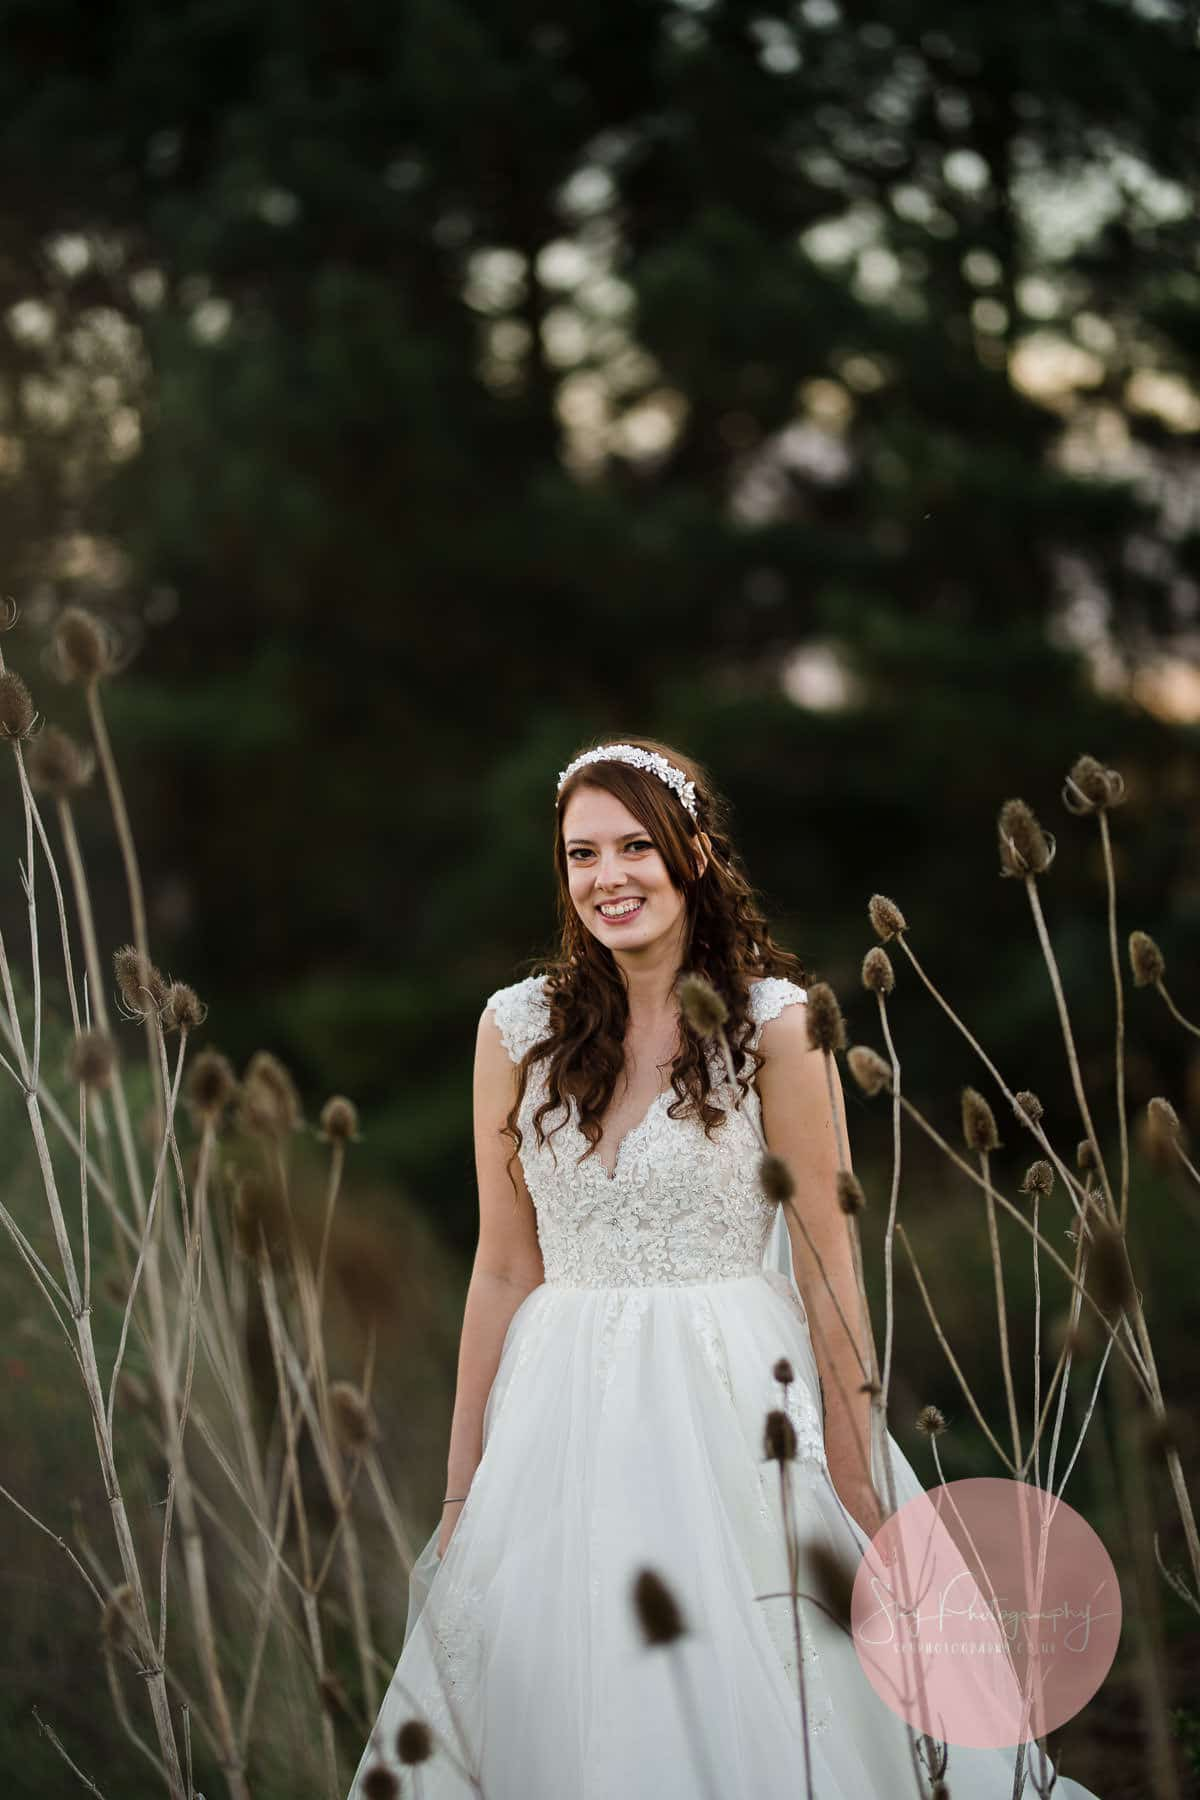 Dodmoor house wedding bride and groom portaits